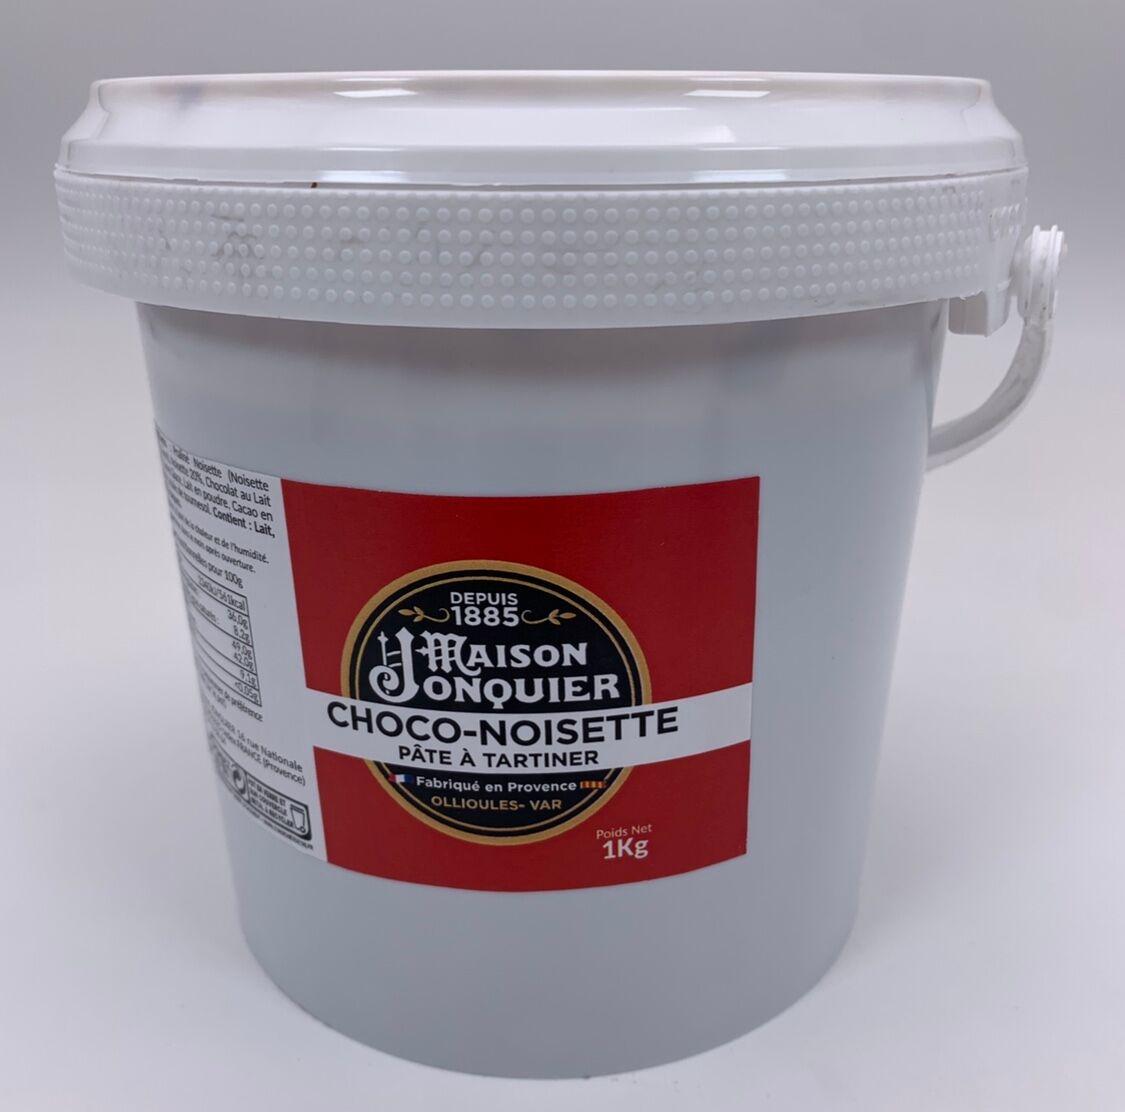 Maison Jonquier Pâte À Tartiner Choco Noisette